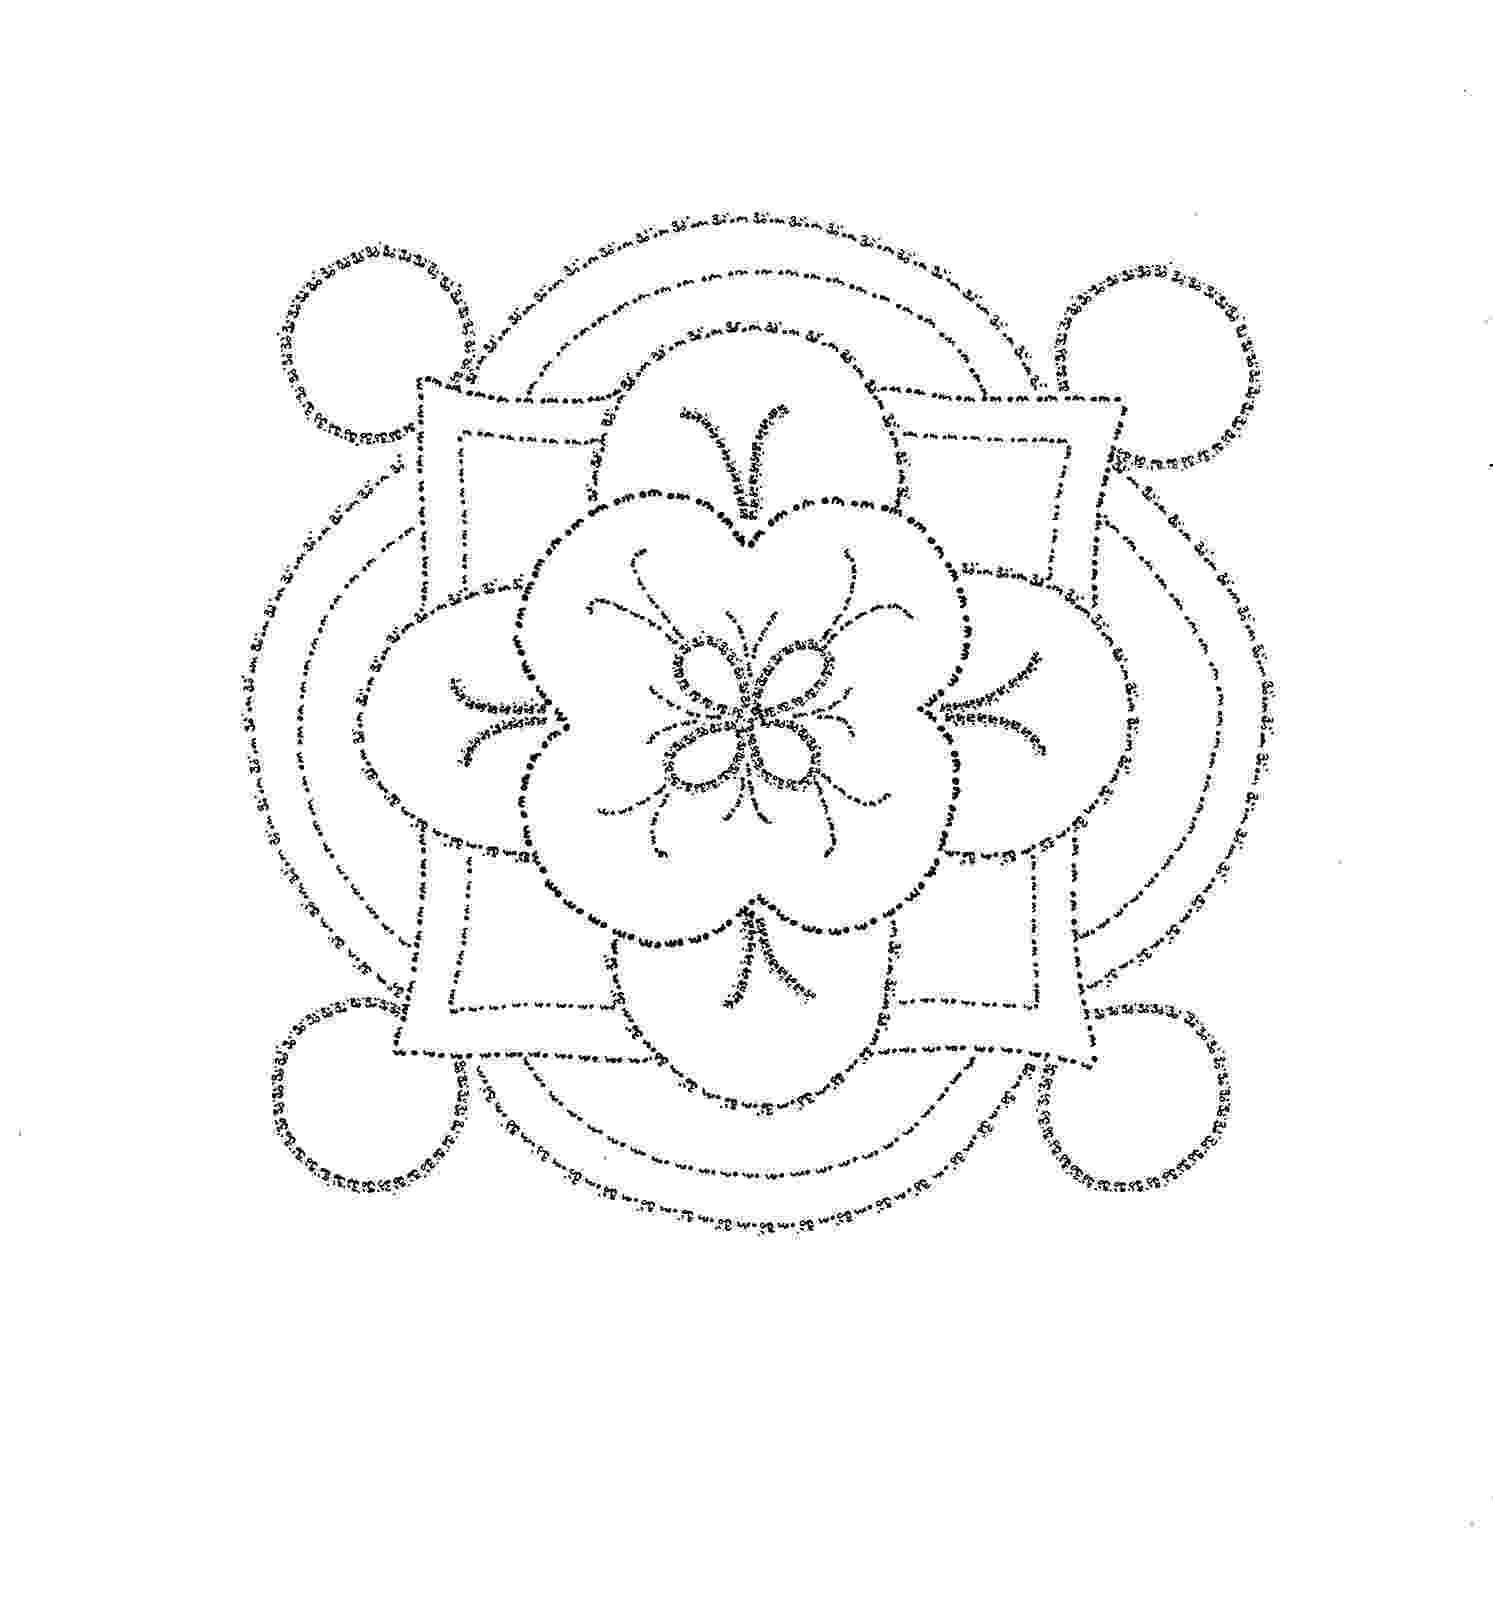 rangoli colouring pattern free printable rangoli coloring pages for kids rangoli pattern colouring 1 1